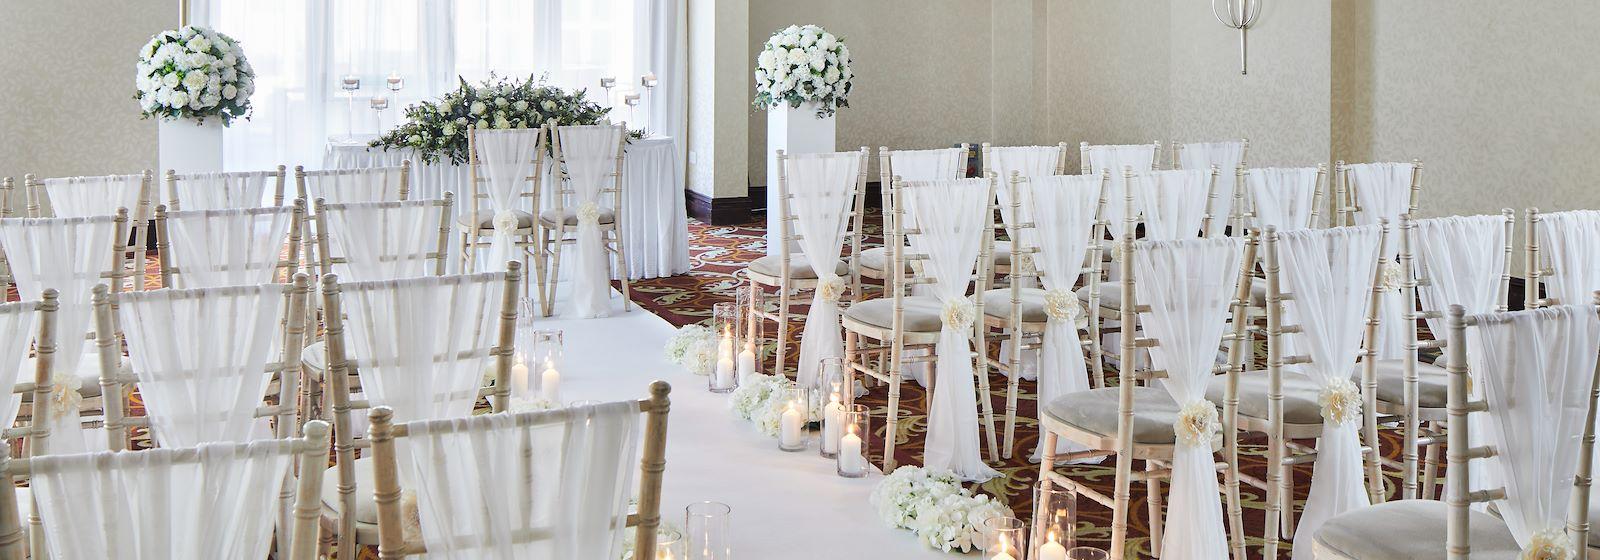 worsley park marriott wedding party function rooms